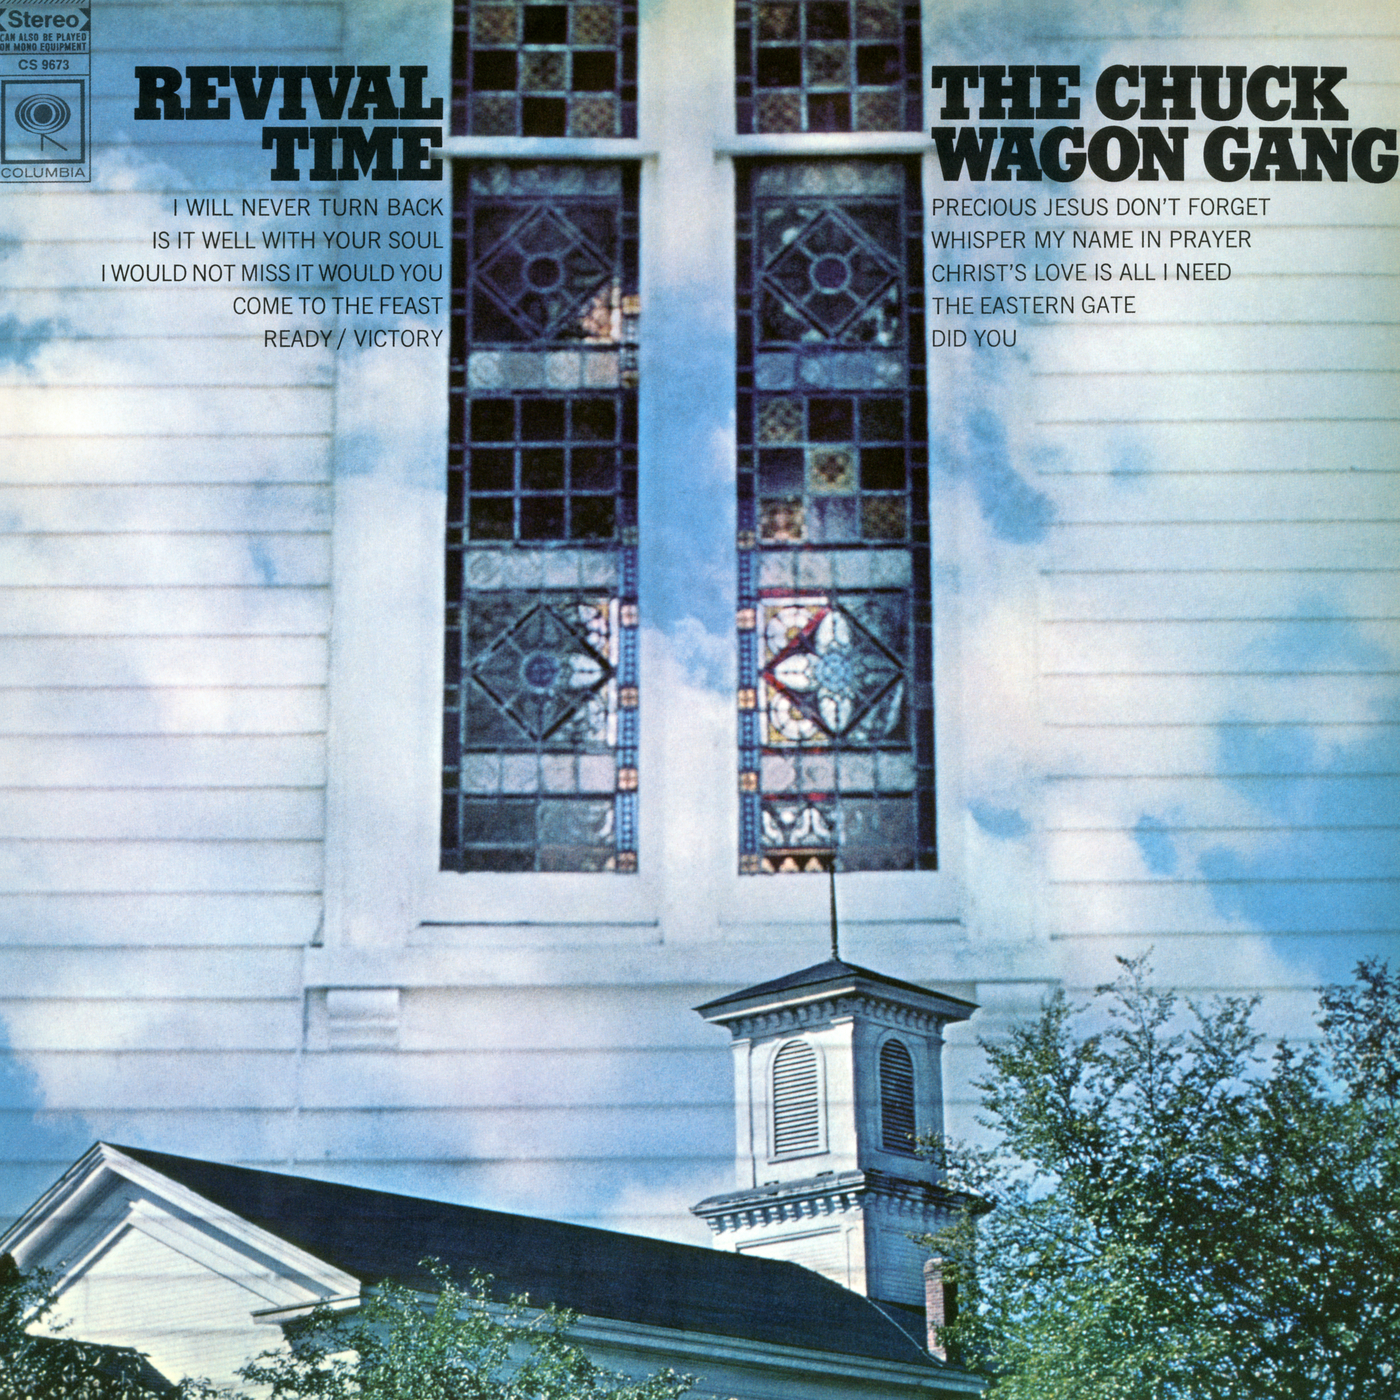 Revival Time - The Chuck Wagon Gang